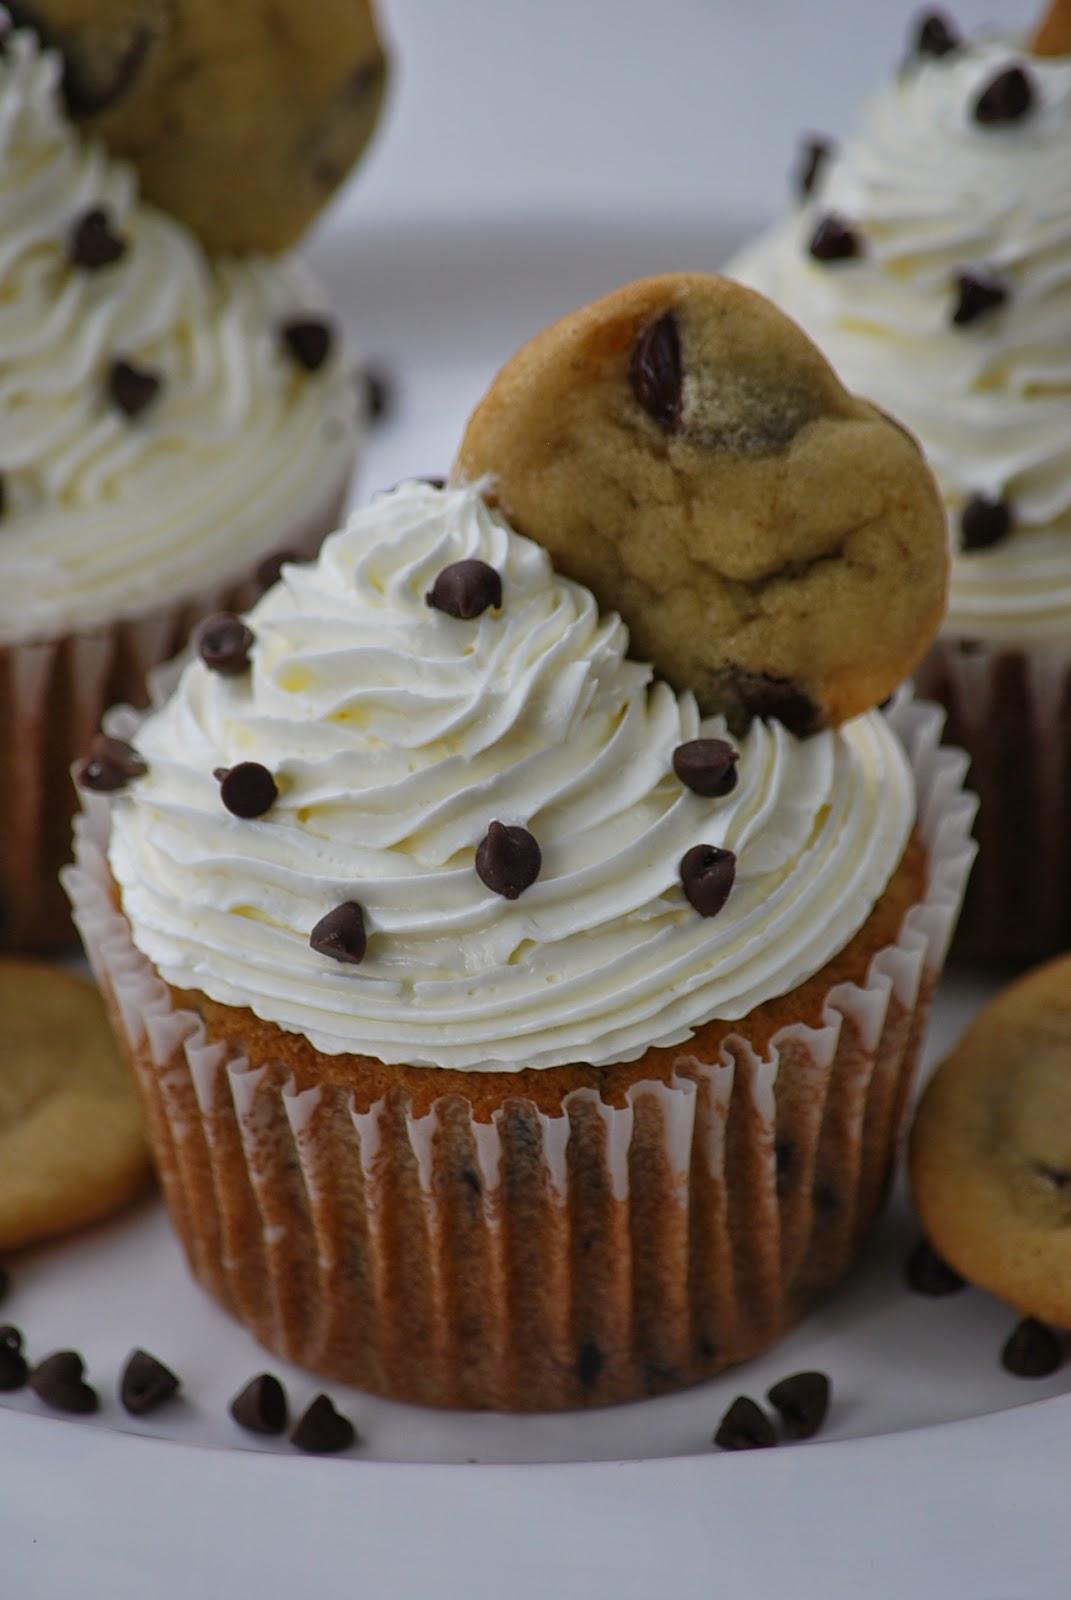 Chocolate Chip Cookie Cupcake